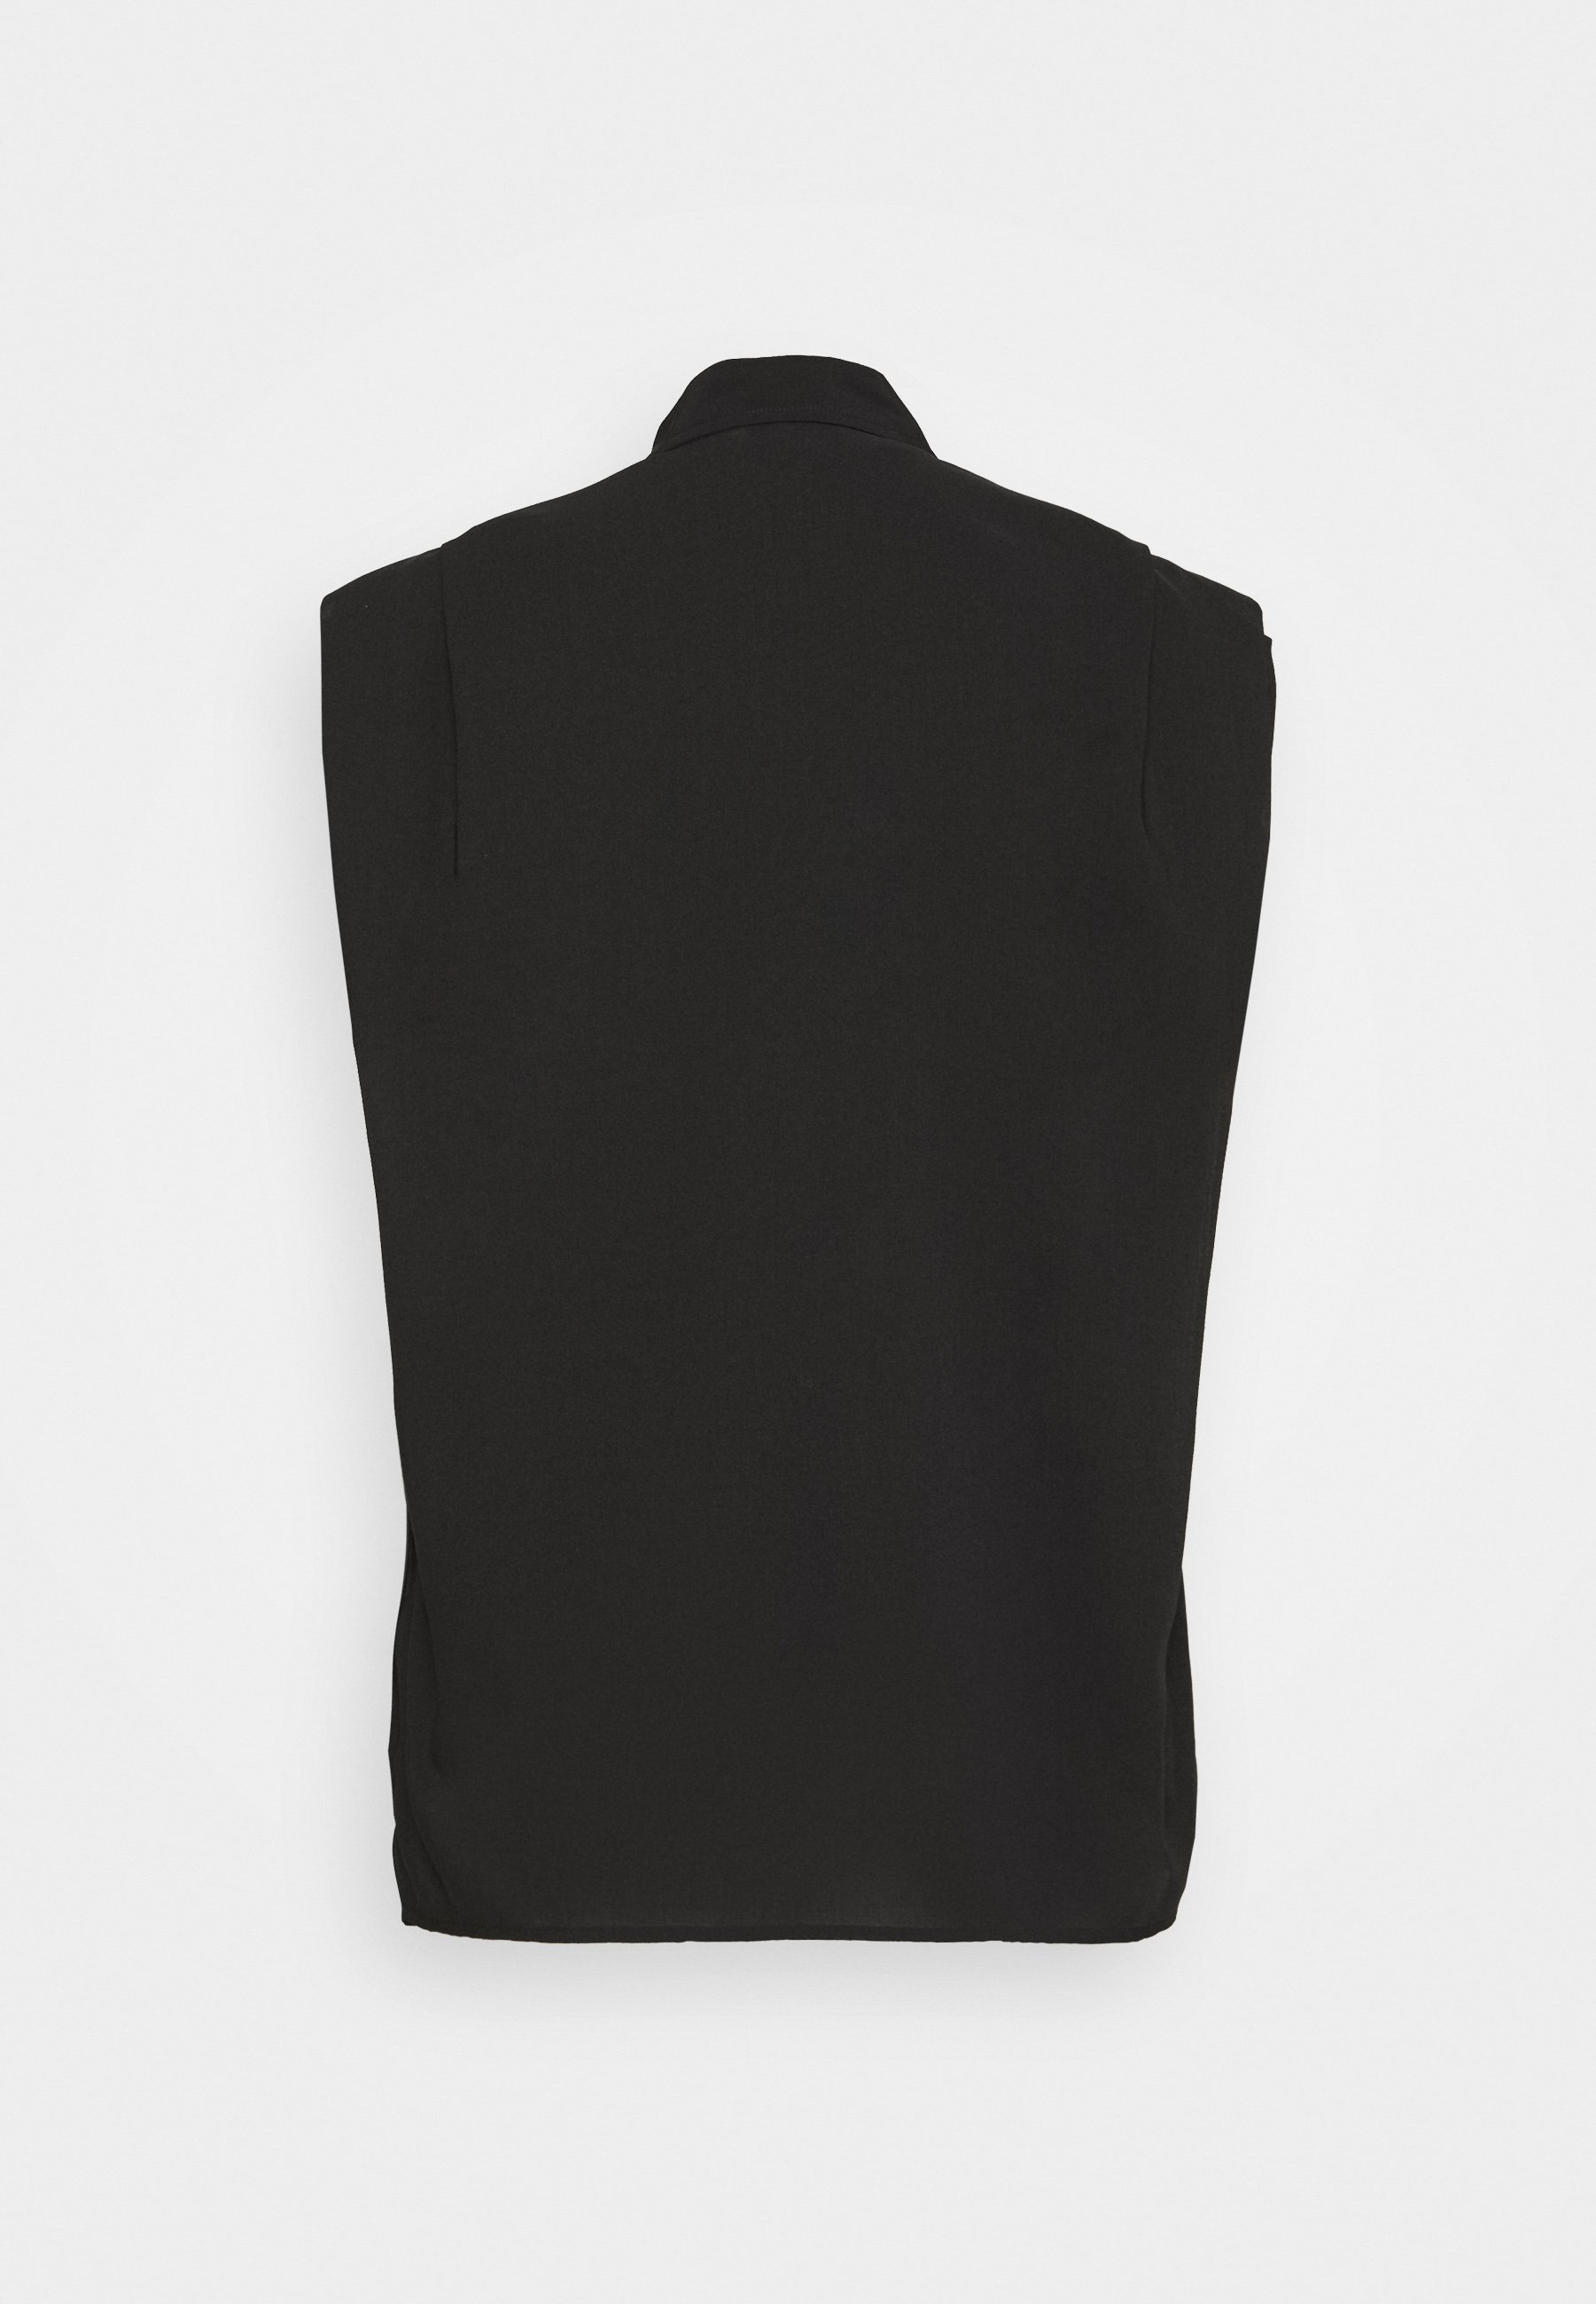 3.1 Phillip Lim Cap Sleeve Blouse - Skjorte Black/svart